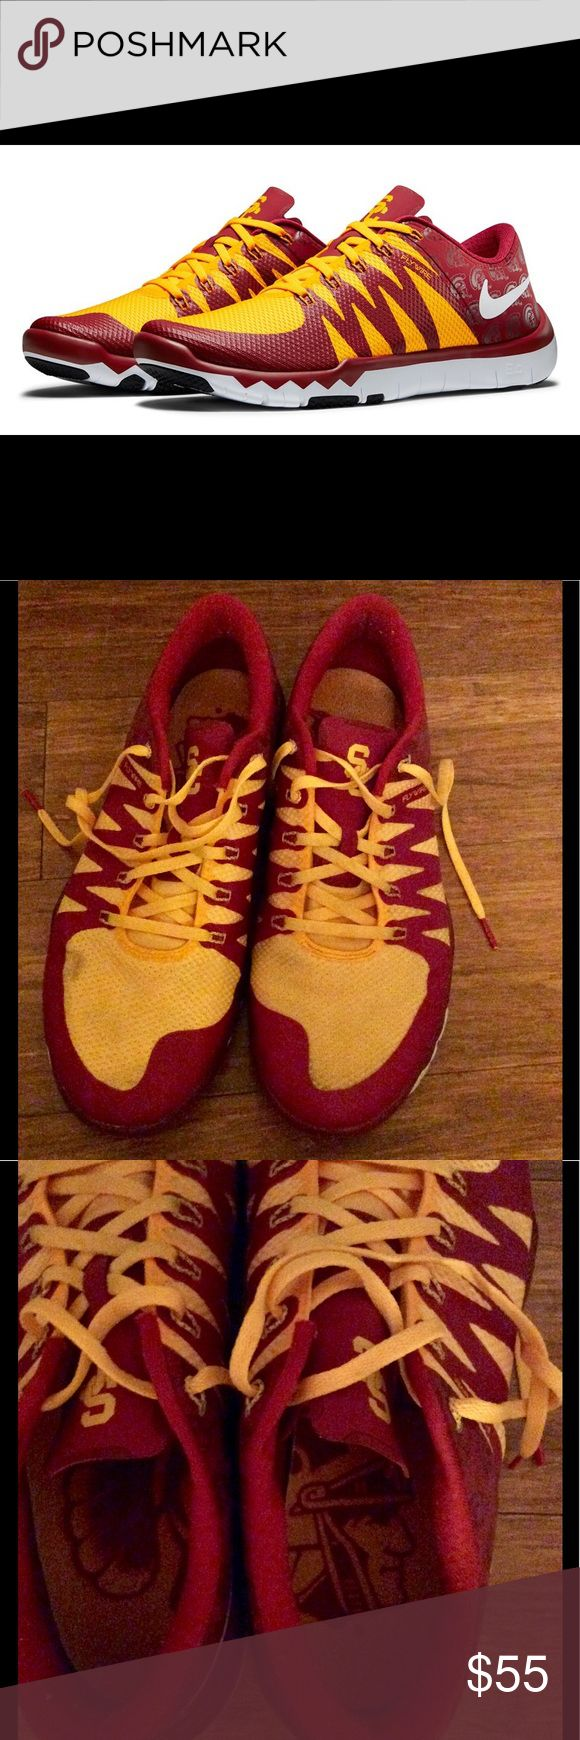 "Nike's USC College Football ""Week Zero"" Shoes GUC Nike's USC College Football ""Week Zero"" Shoes GUC. Nike Shoes Sneakers"